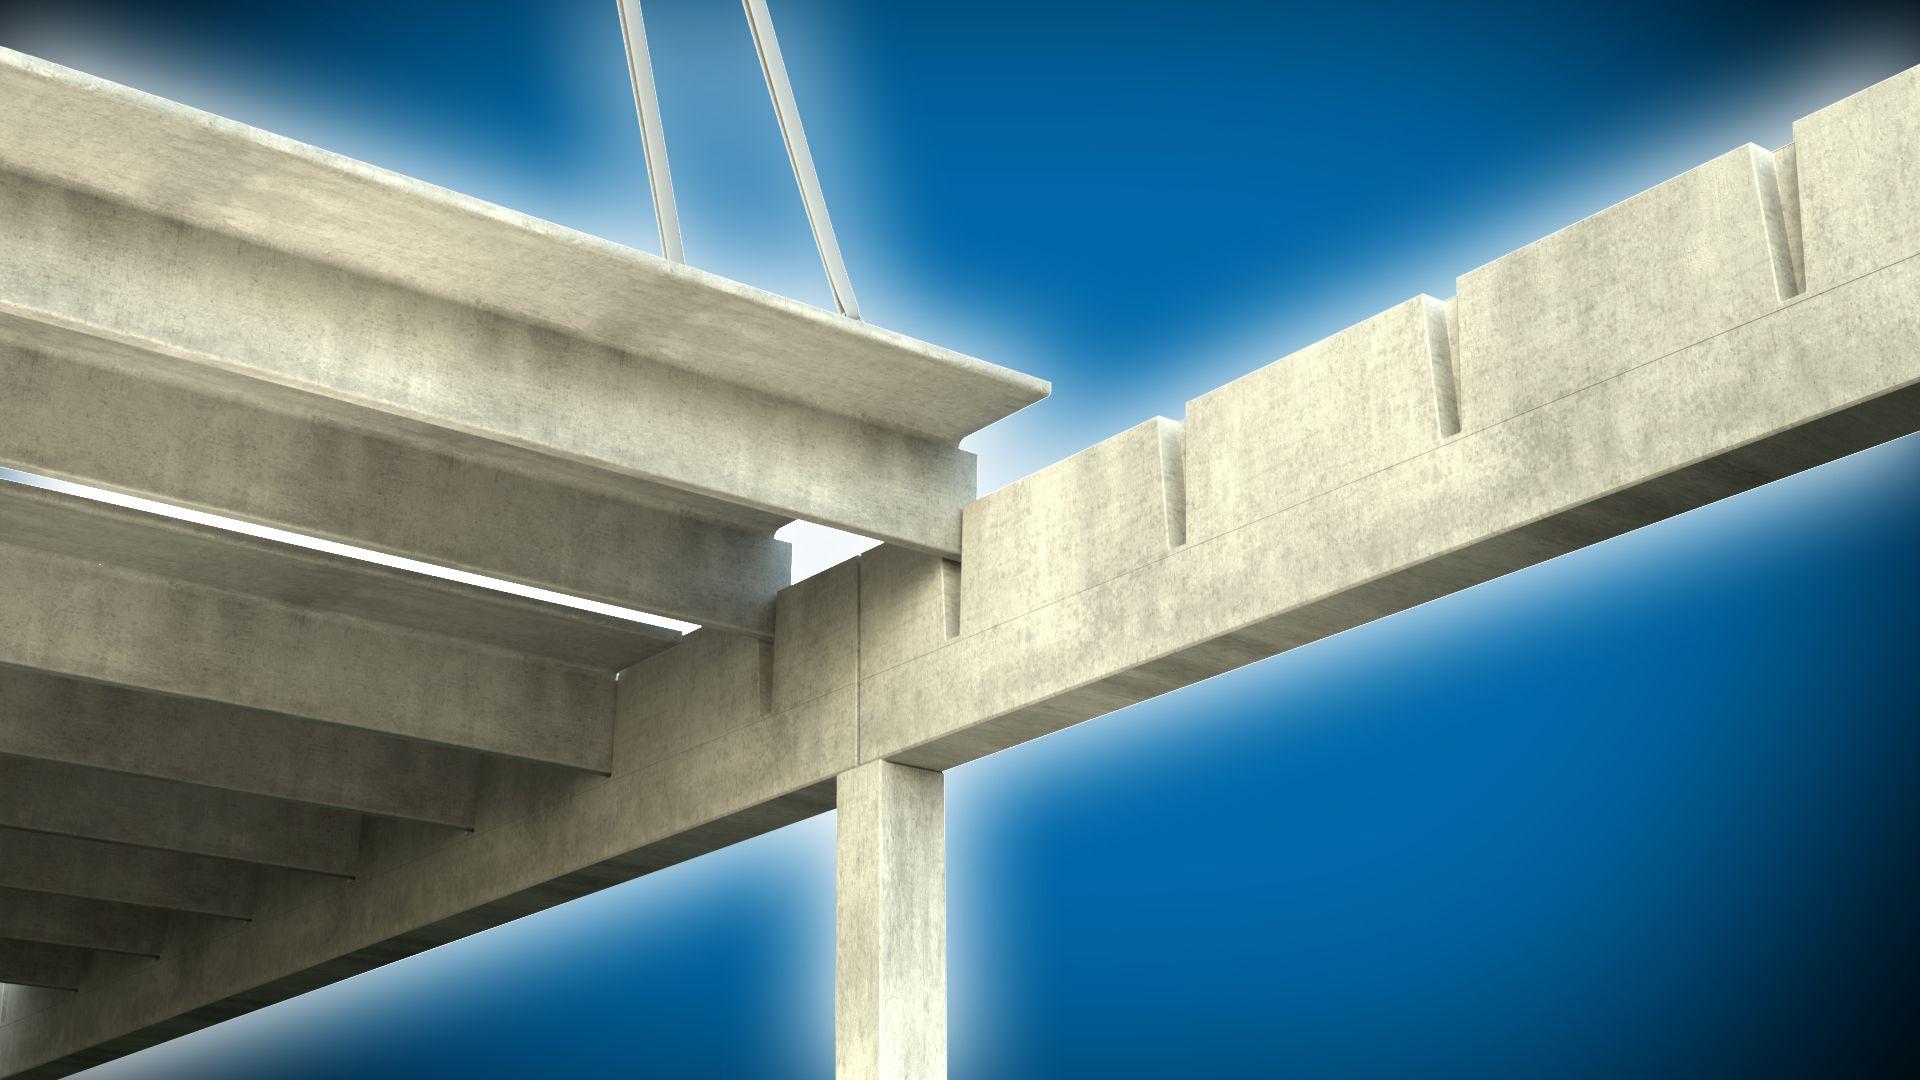 Concrete architecture wells concrete architectural for Architectural beams